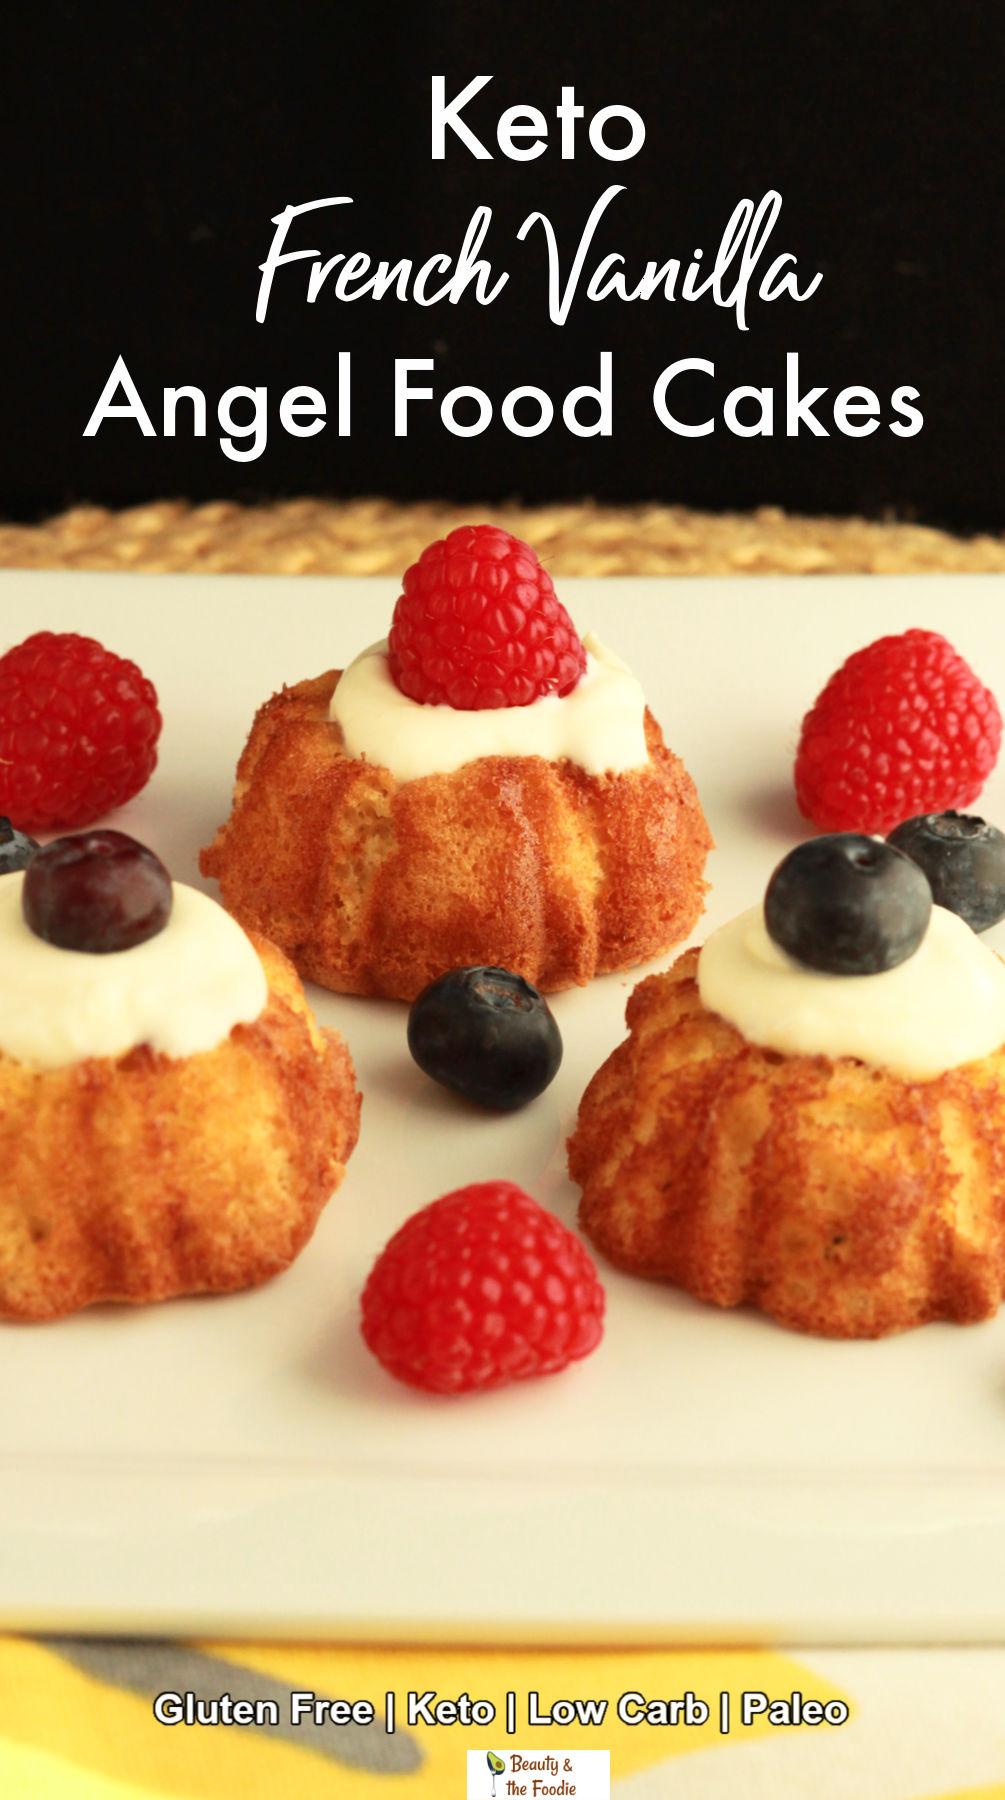 Mini vanilla bundt cakes with whipped cream & berries